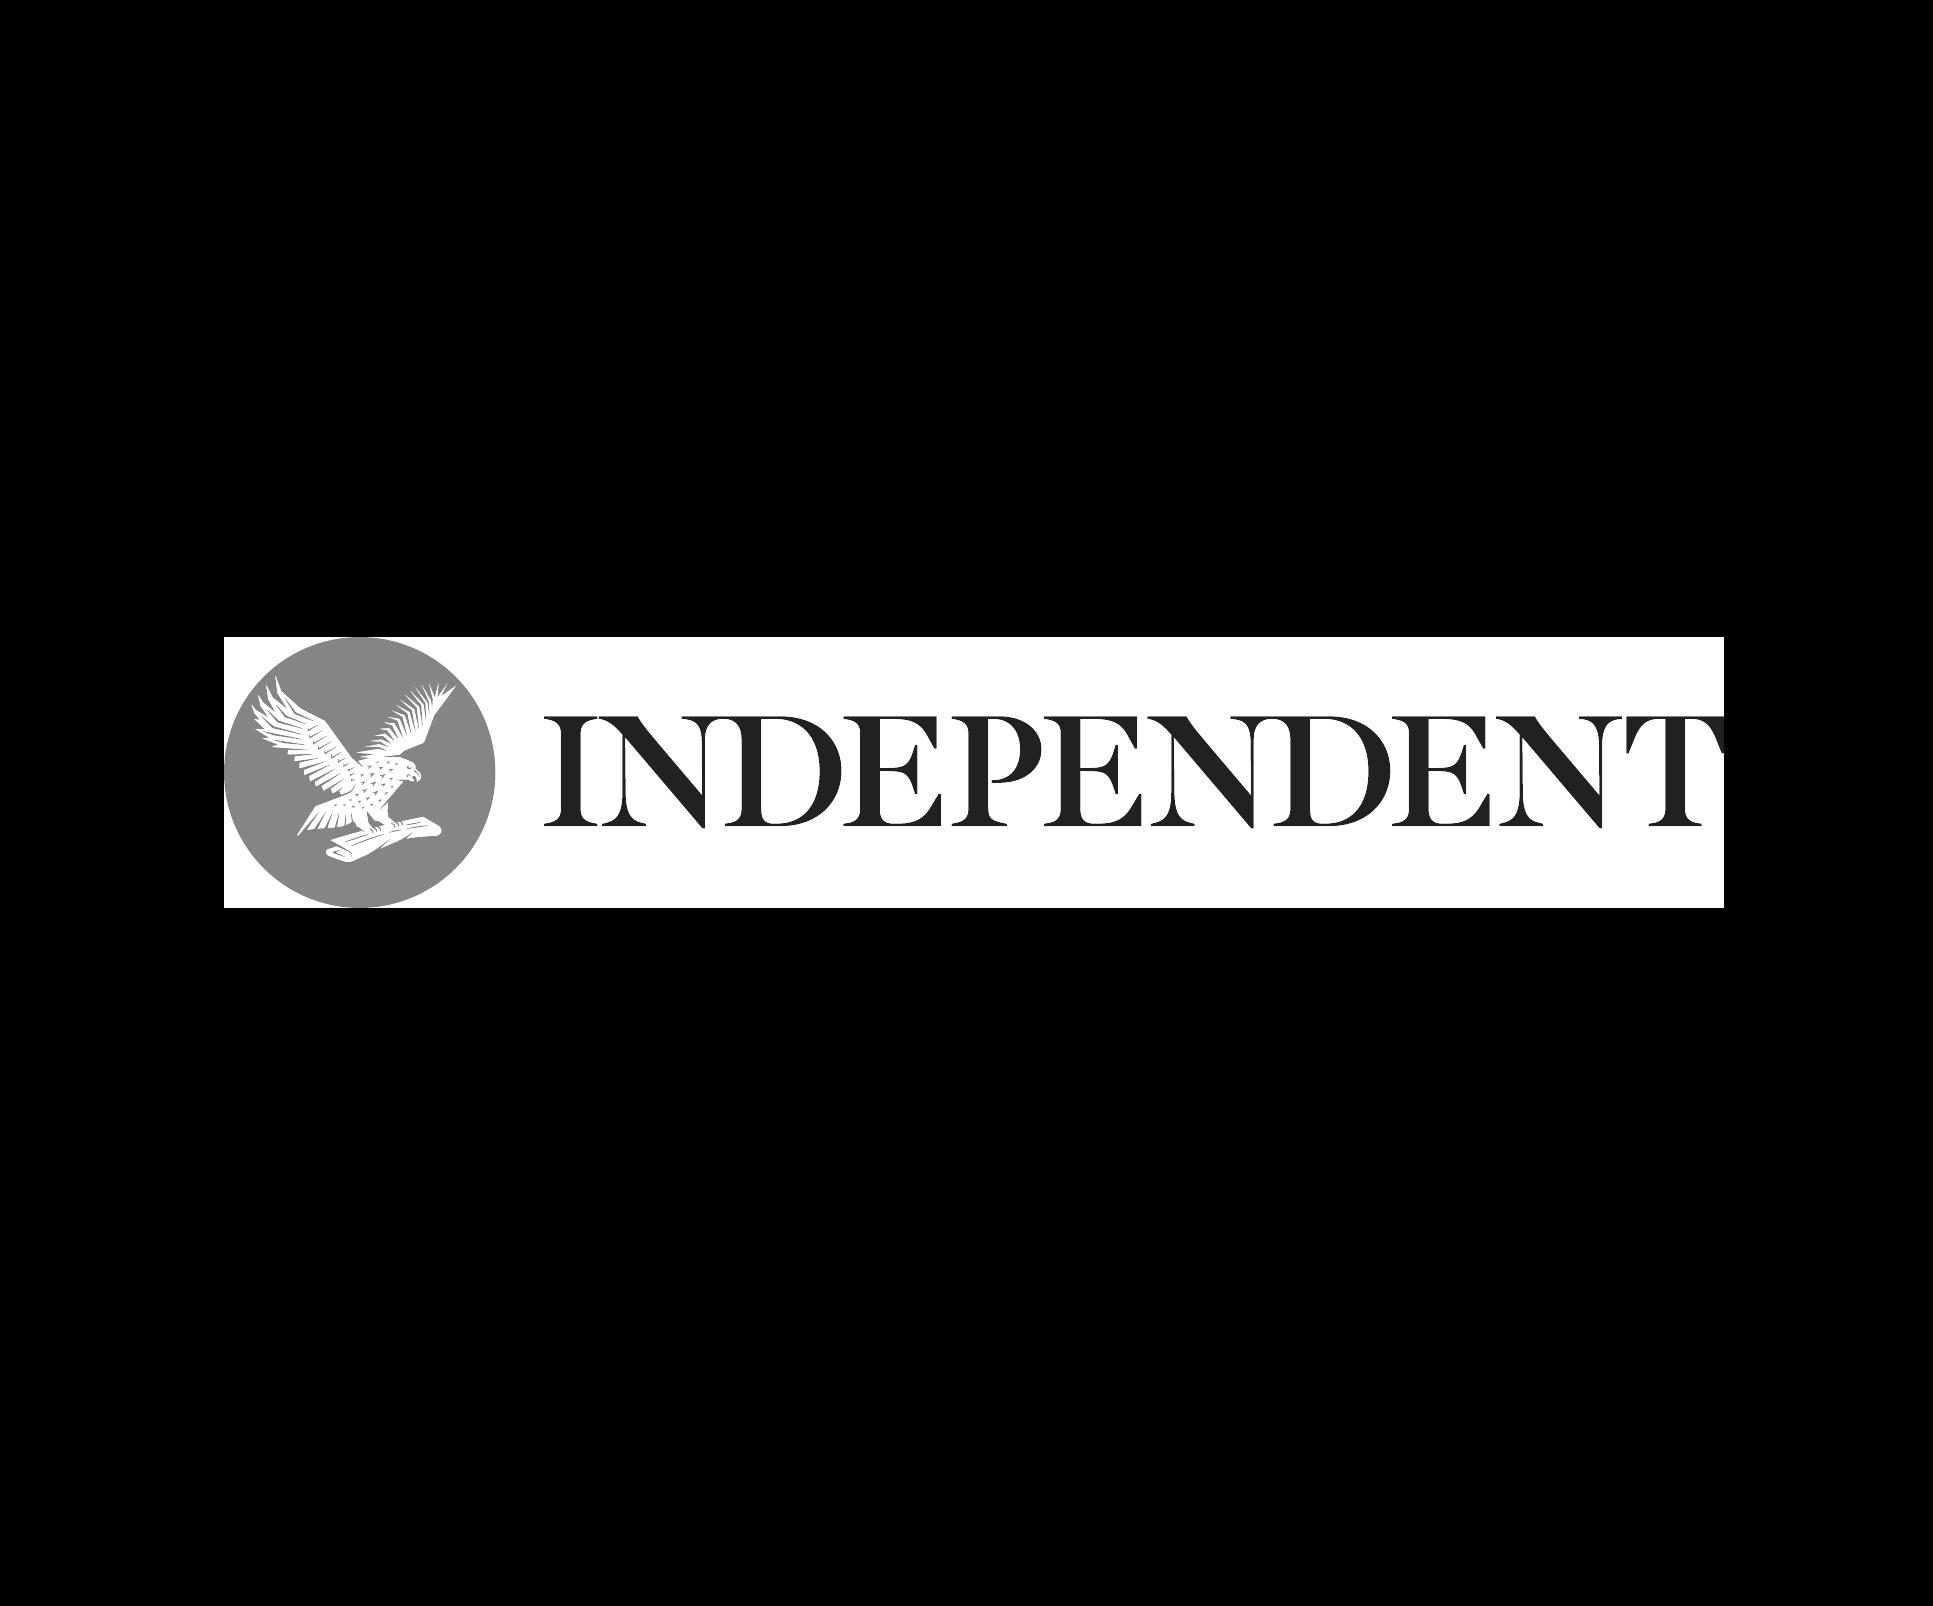 independentttt.png